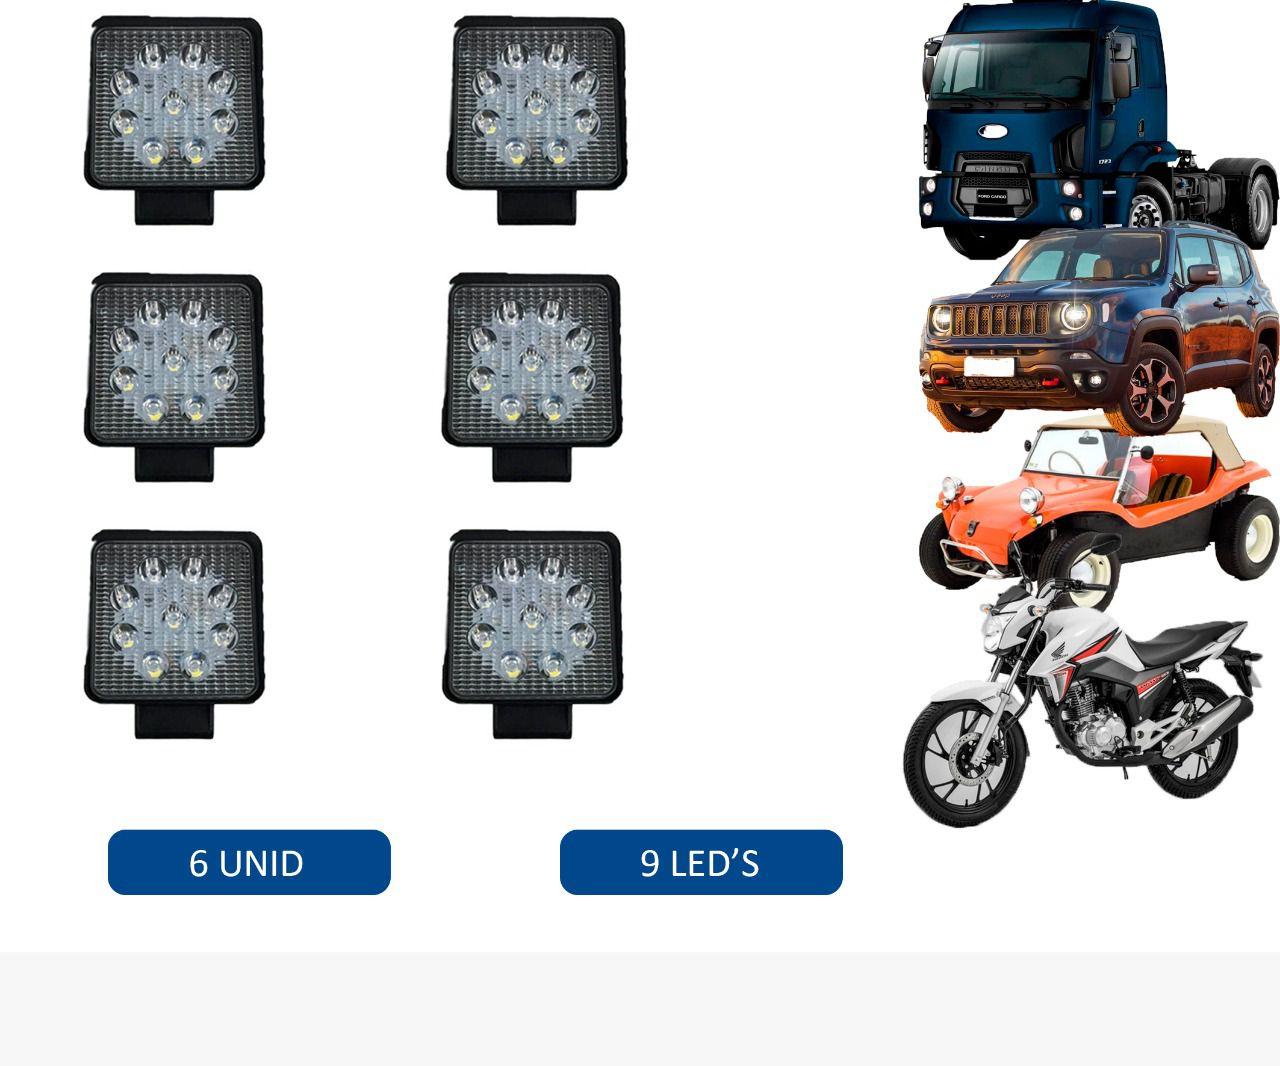 Kit Farol Milha Quadrado 6 Unidades 12V E 24V 27W Universal